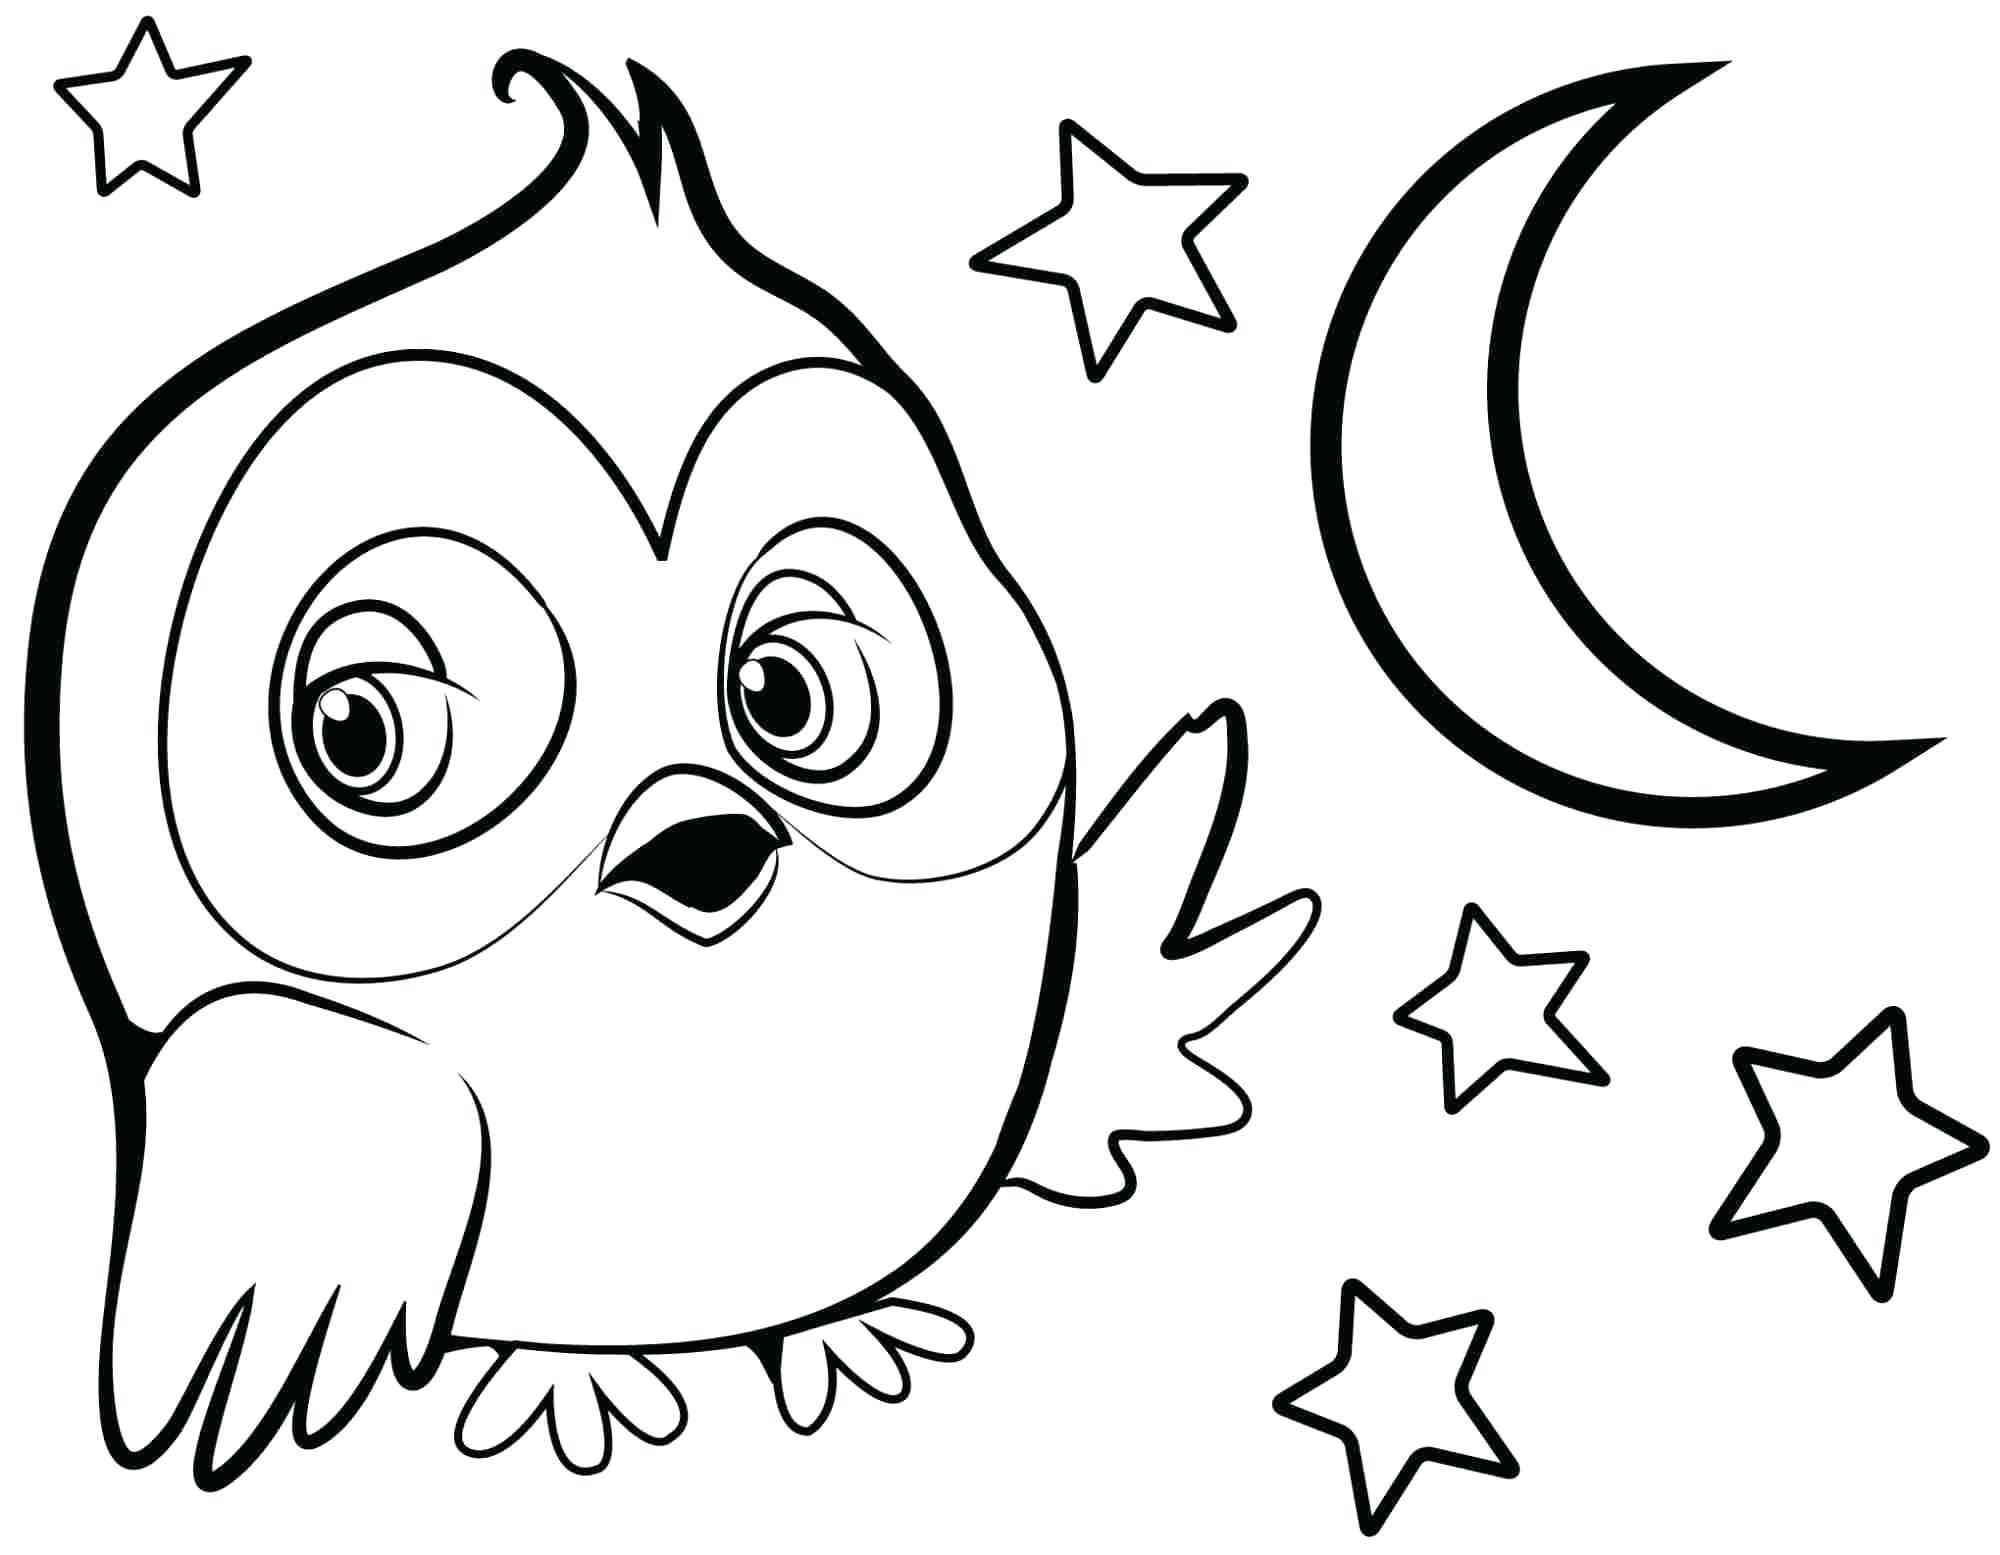 2000x1555 Printable Preschool Animal Coloring Pages Owl Printable Click